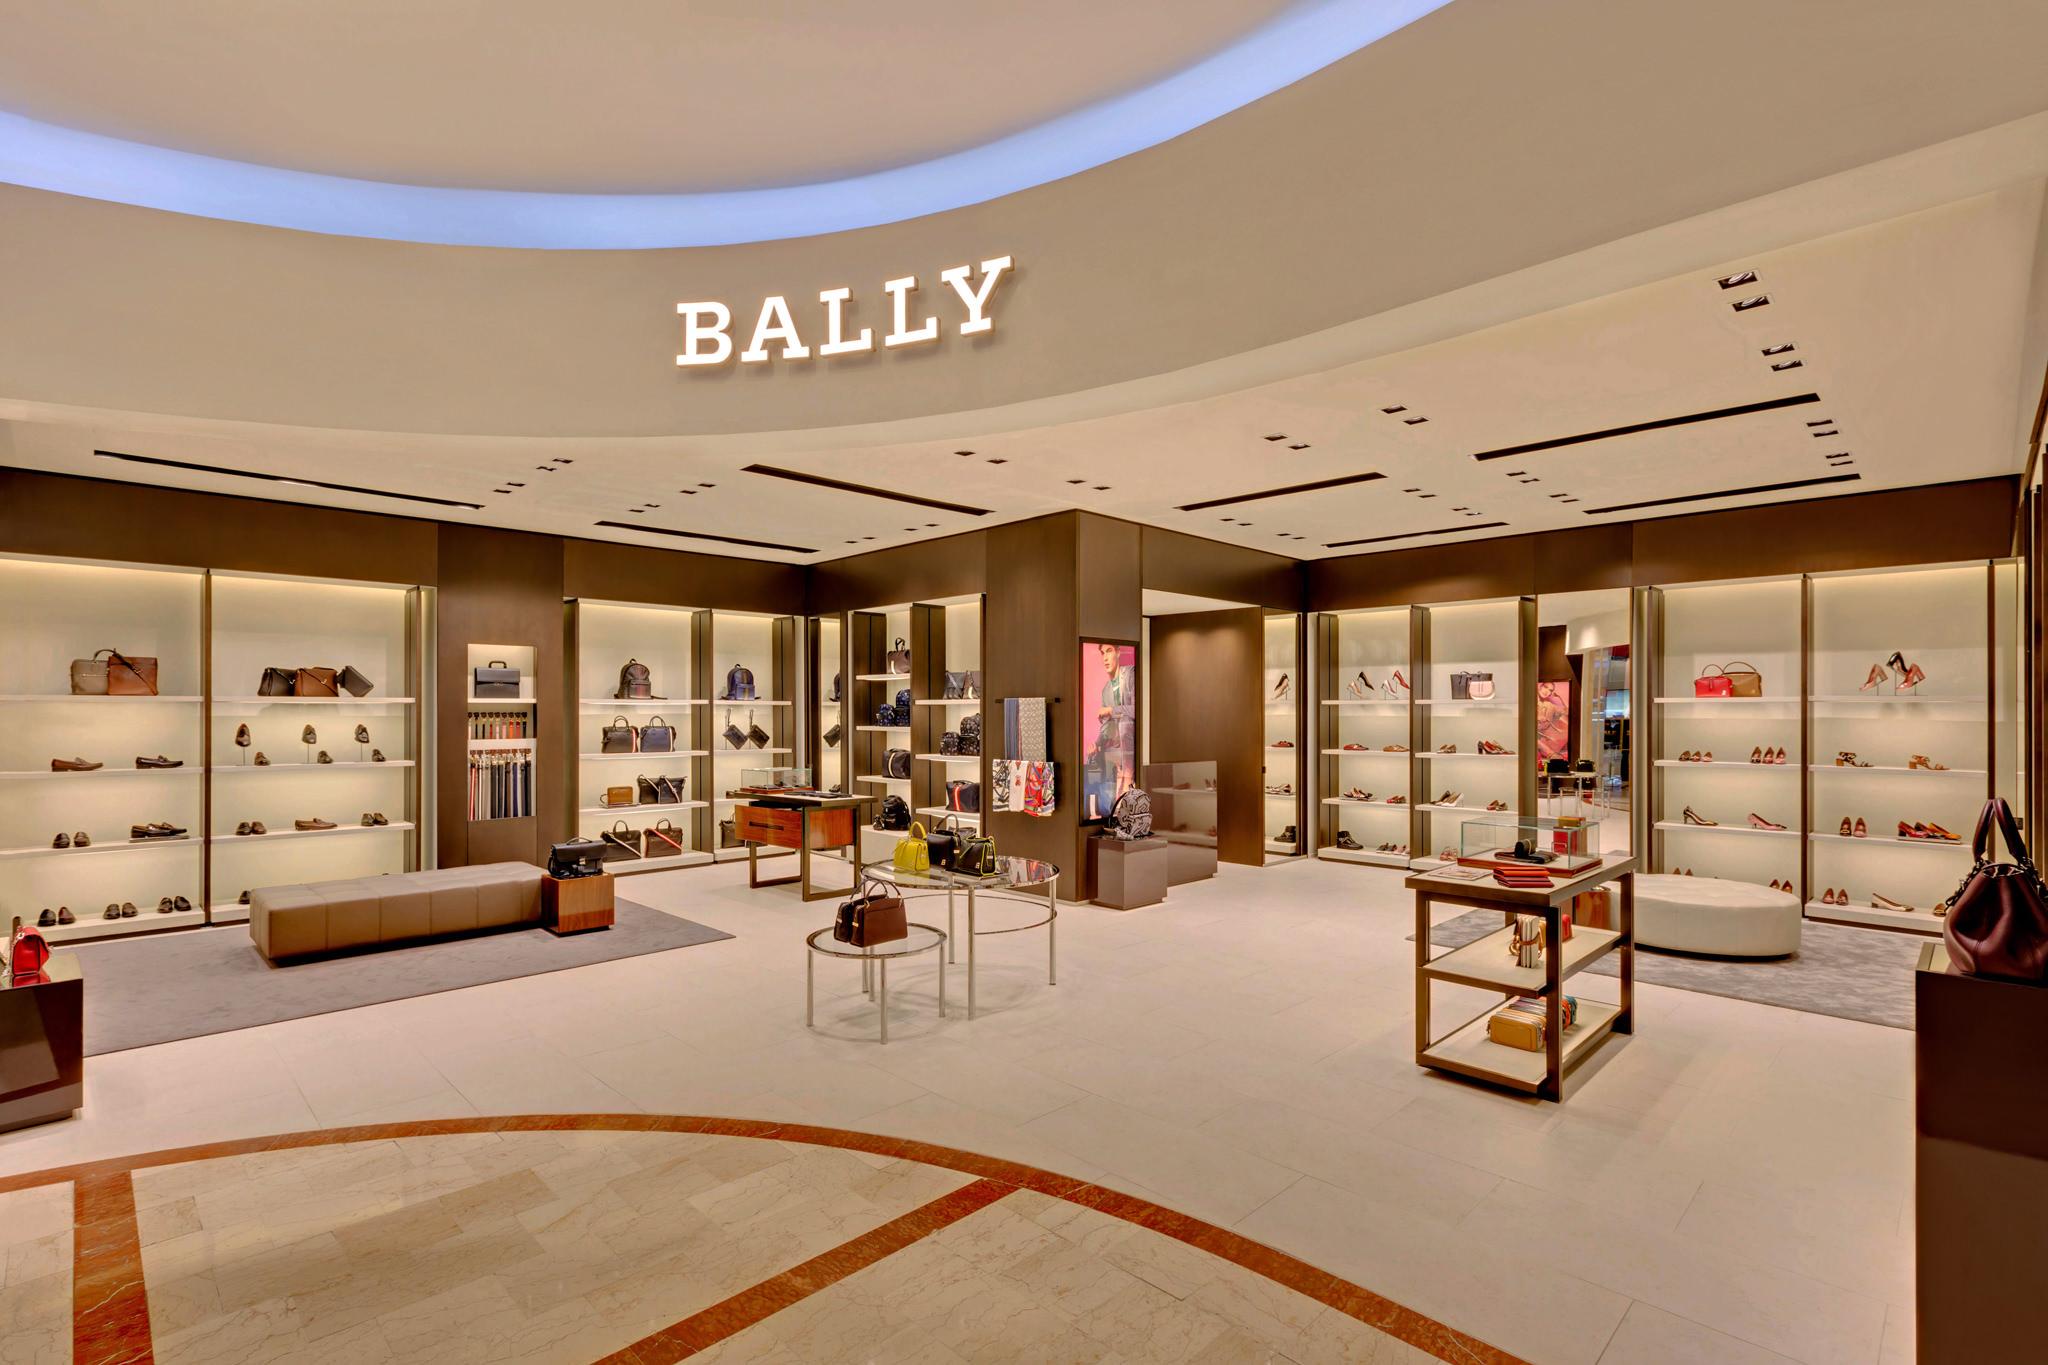 20170721 - Bally - HCM - Commercial - Interior - Store - Retouch 0001.jpg